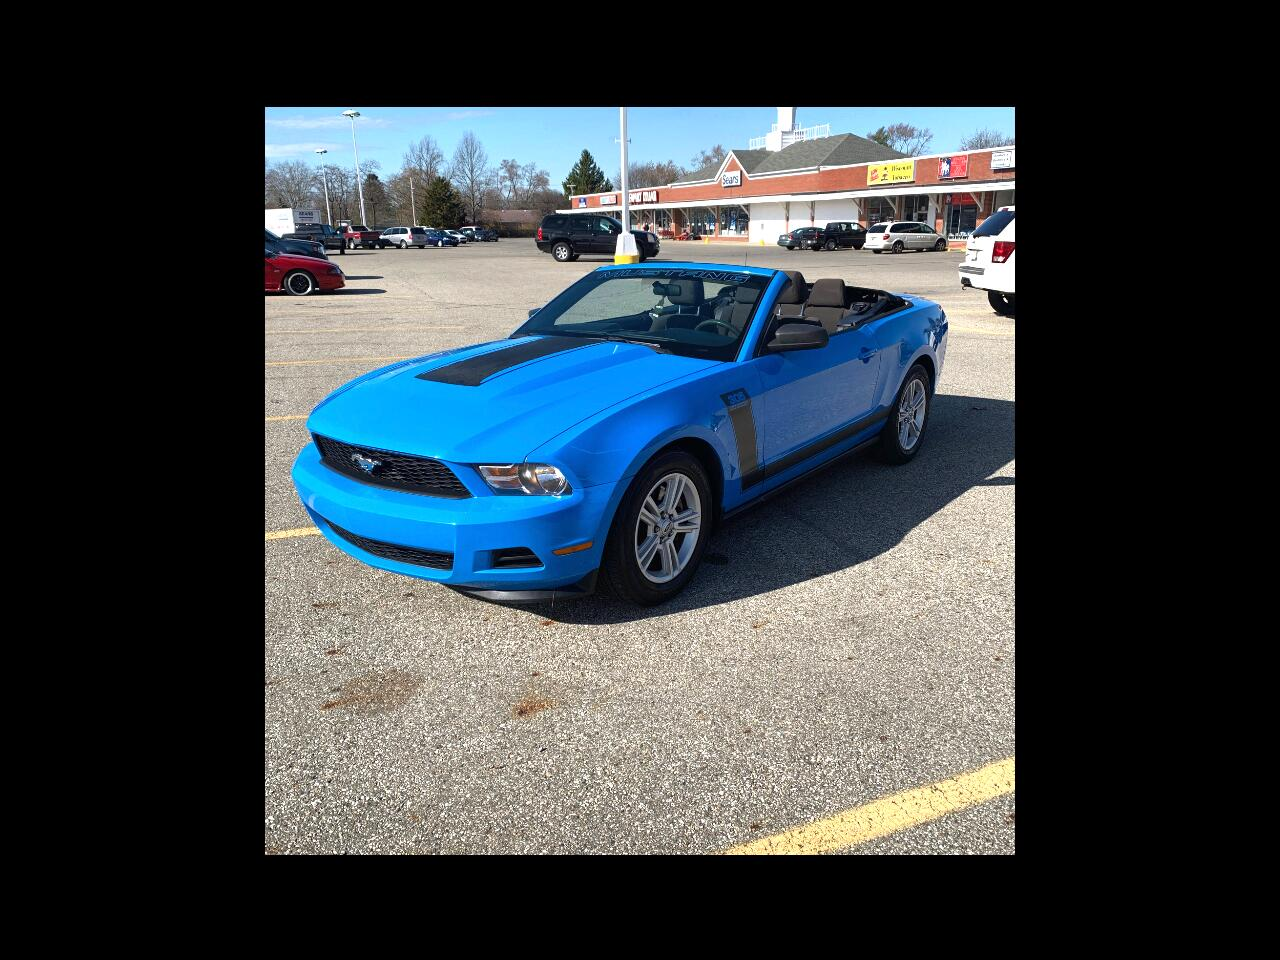 Ford Mustang V6 Convertible 2012